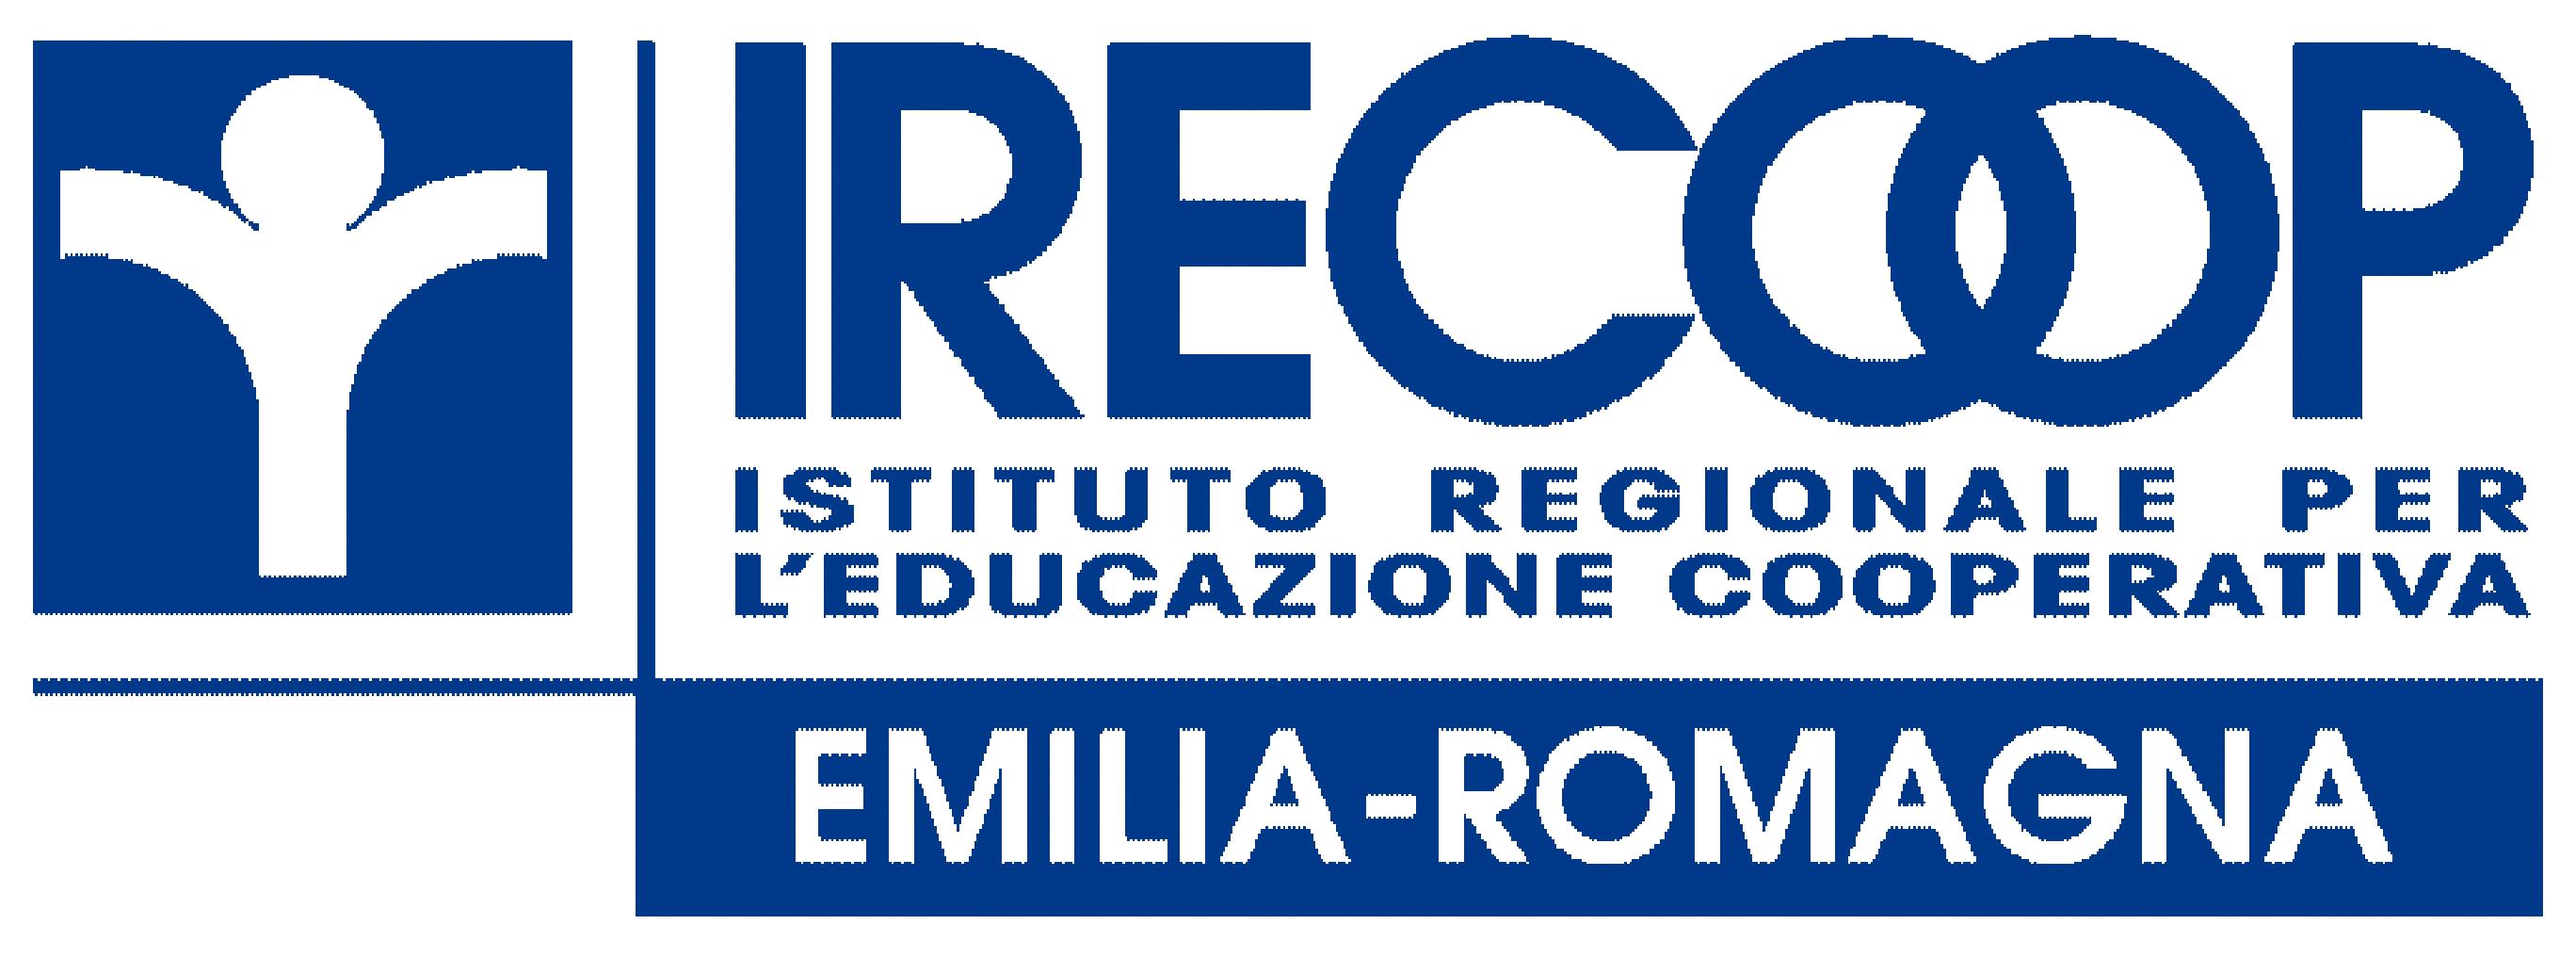 wp-content/uploads/img-loghi12/IrecoopBologna_logo.jpeg